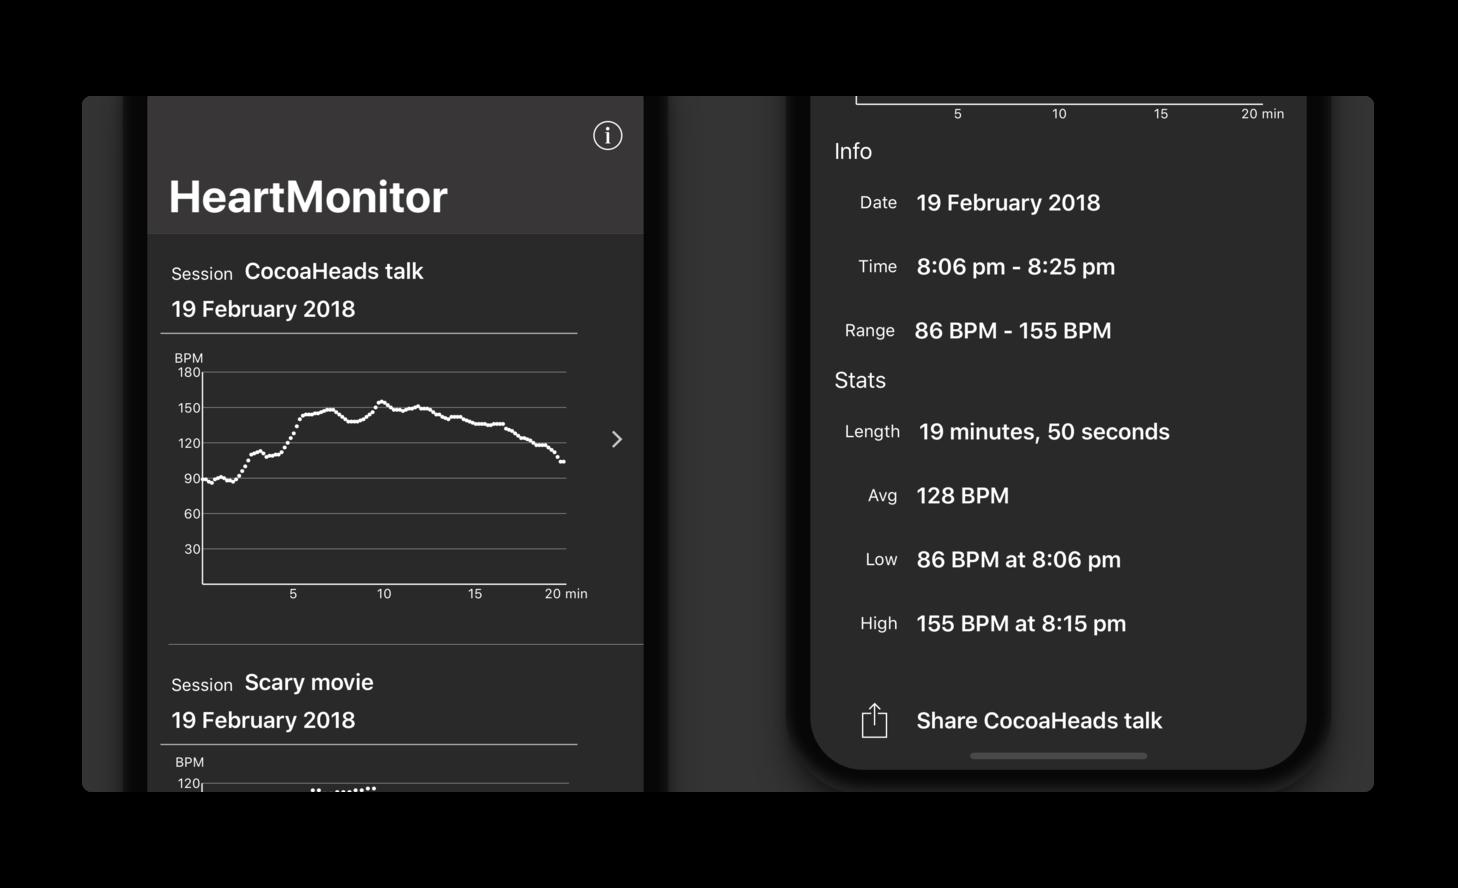 Apple Watch心拍センサーを使用してワークアウトをしなくても心拍数を連続的に記録する「HeartMonitor」がリリース